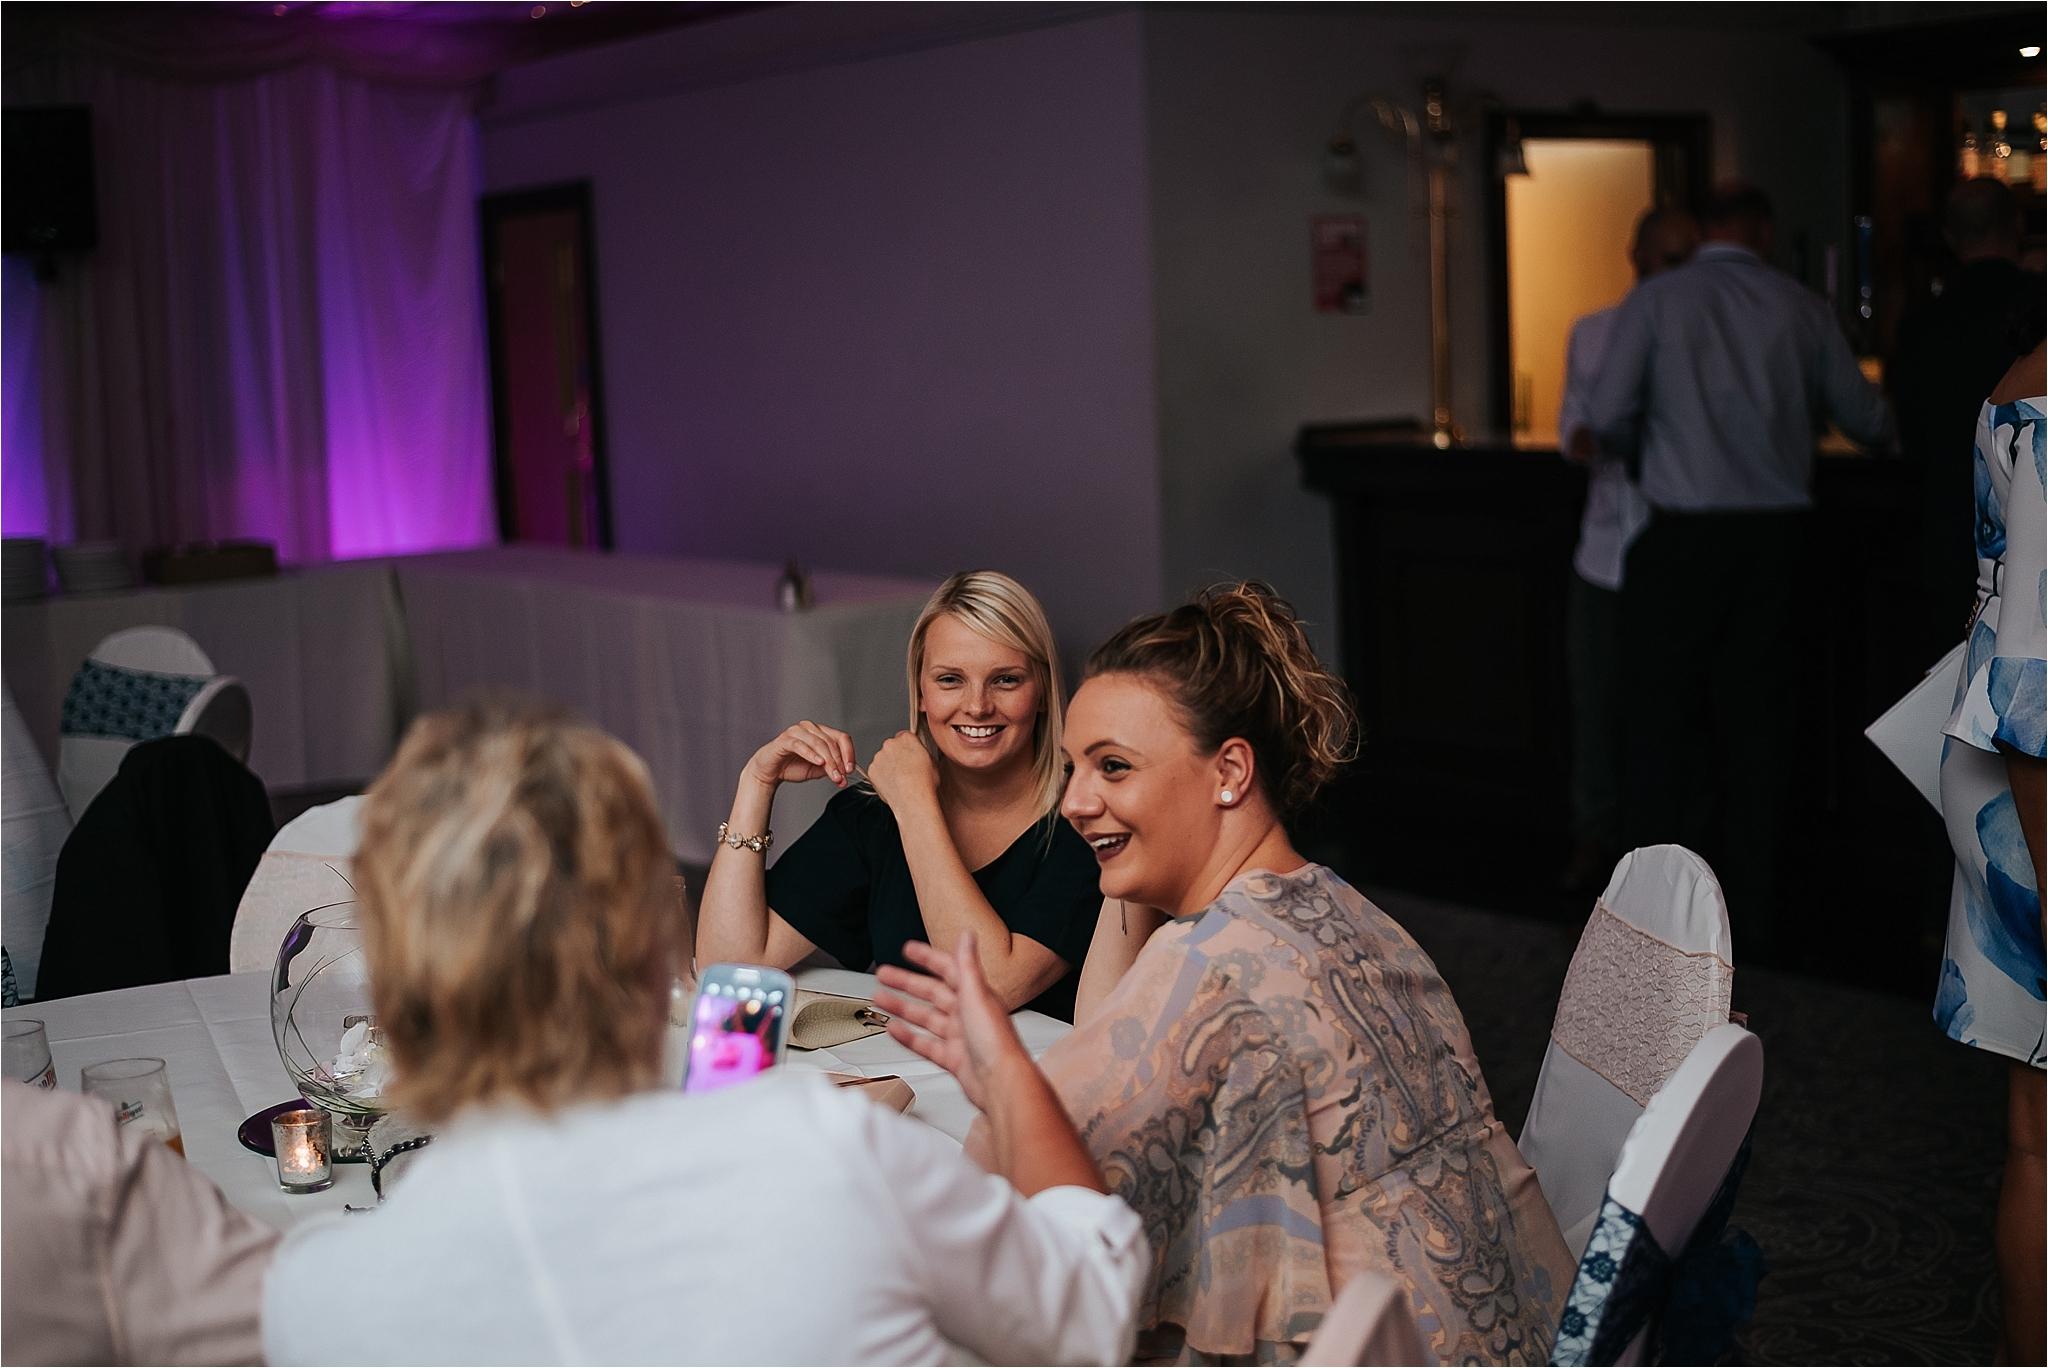 thevilla+lancashire+wreagreen+wedding+photographer75.jpg